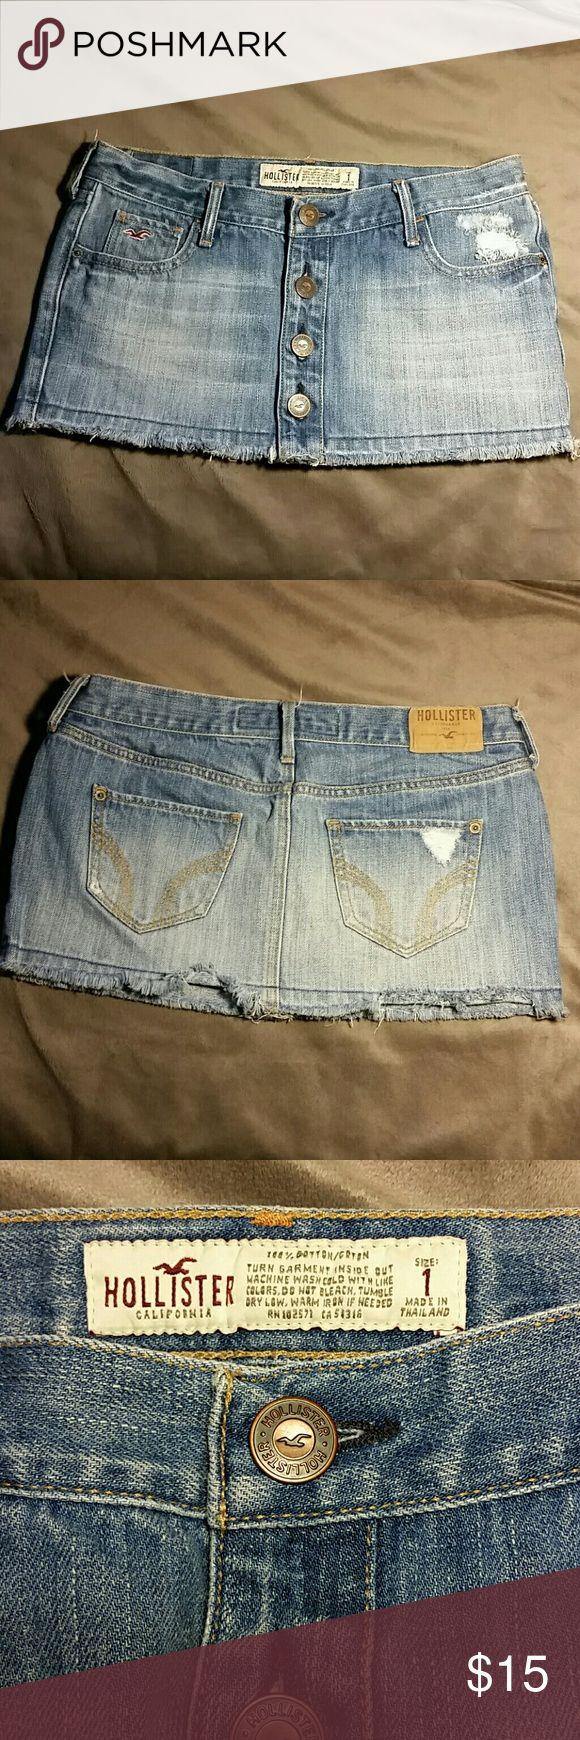 Hollister Micro Skirt Sz 1 skirt. Waist is 12'' Length is 7.5'' Hollister Skirts Mini